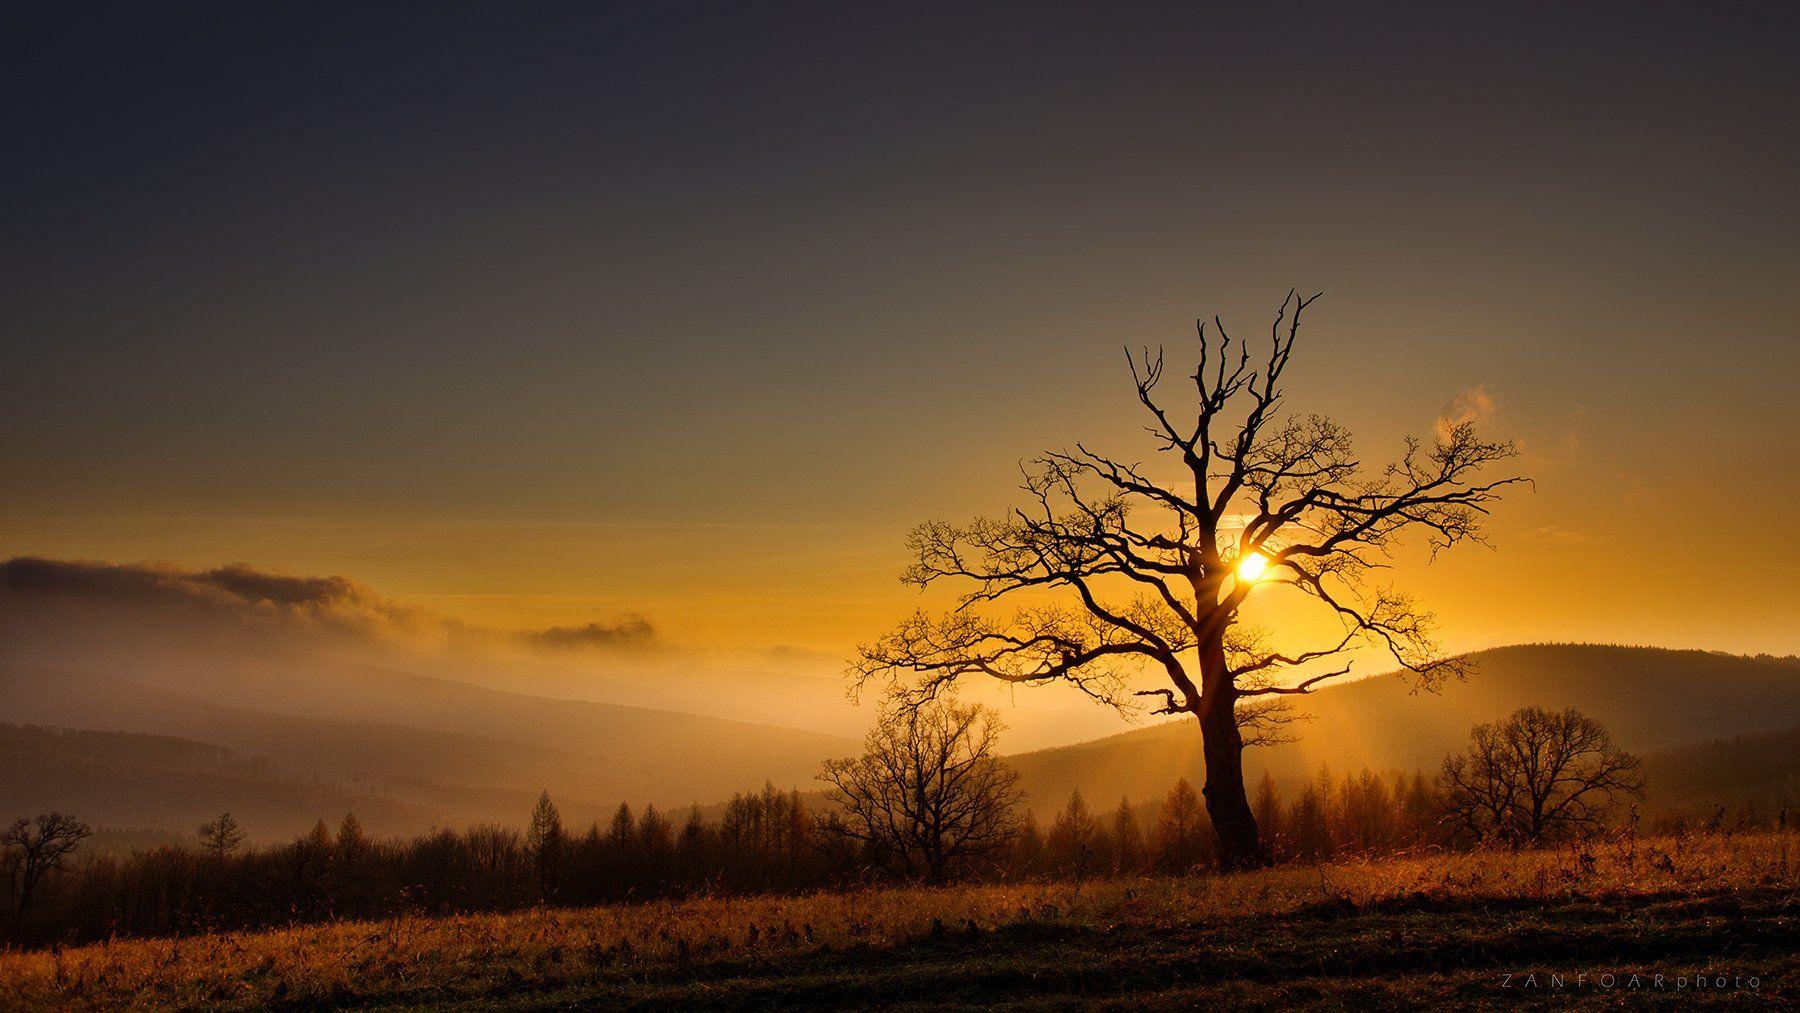 white carpathians,lanscape,landscape,horizont,sunsat,sun,tree,soliter,autumn,rays,zanfoar,czech republi,чехия, Zanfoar